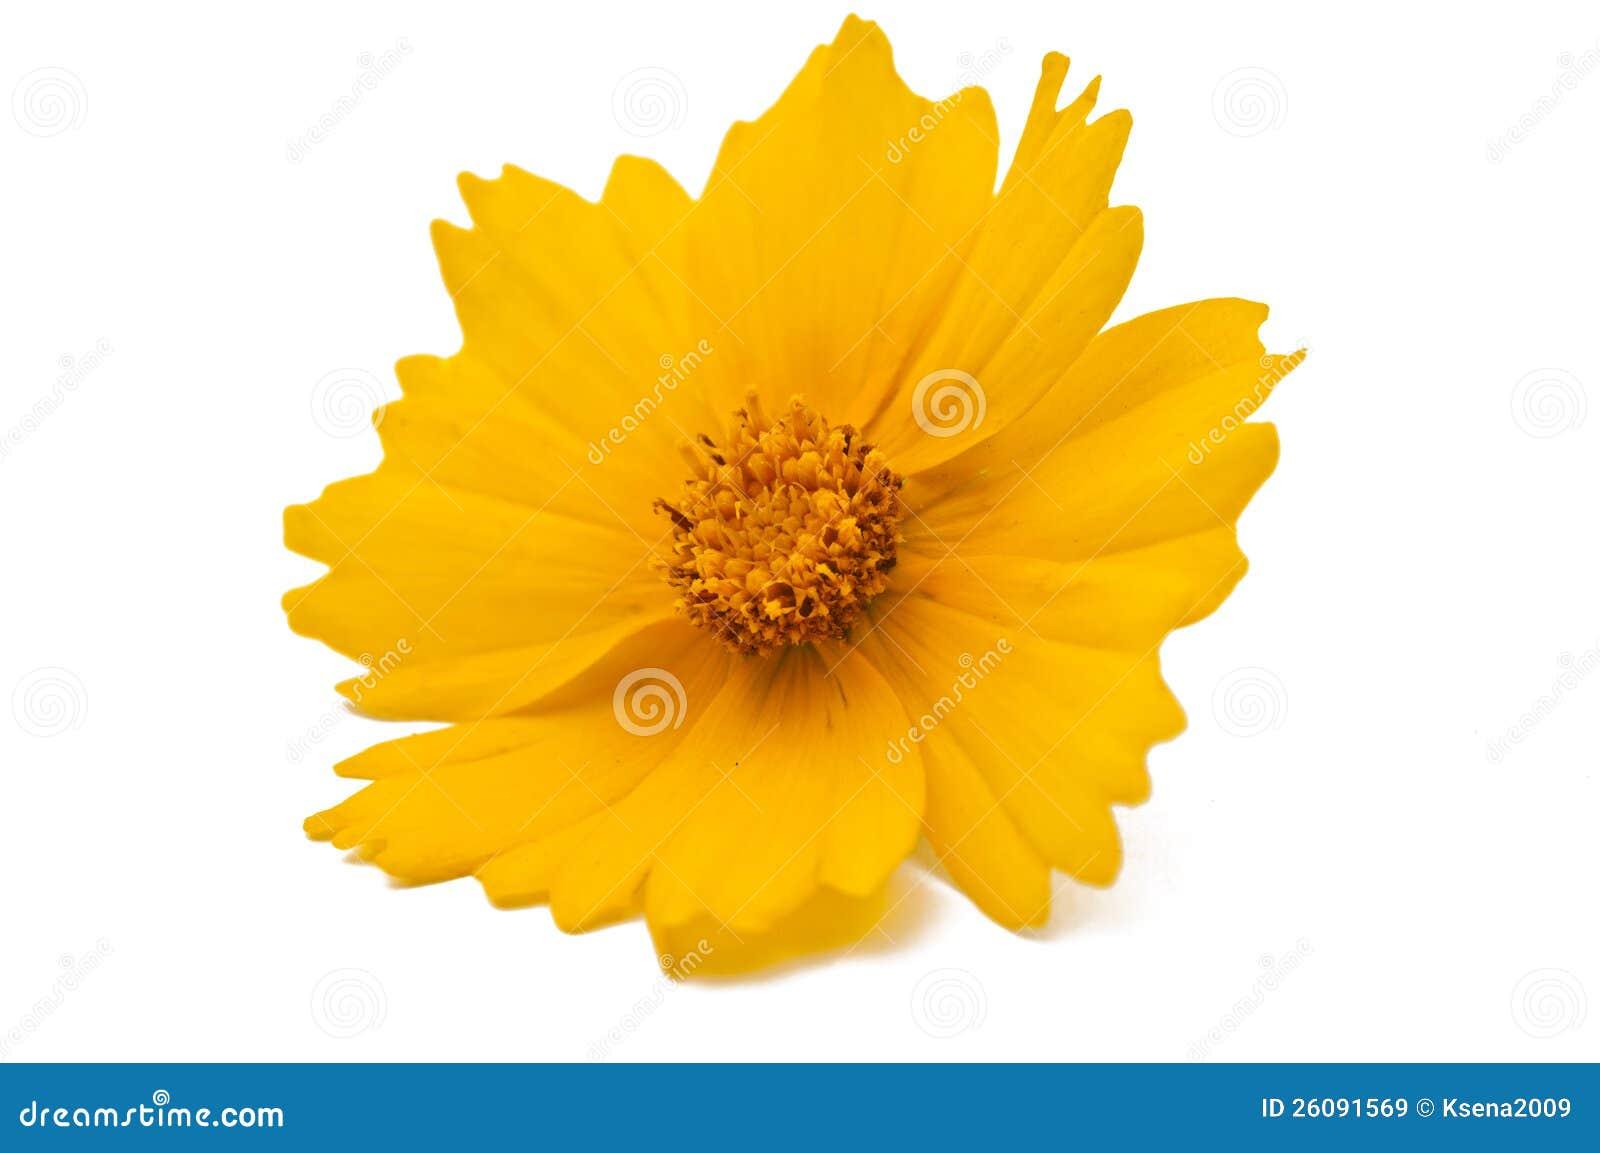 Yellow Flower Isolated Royalty Free Stock Images - Image ... Leelawadee